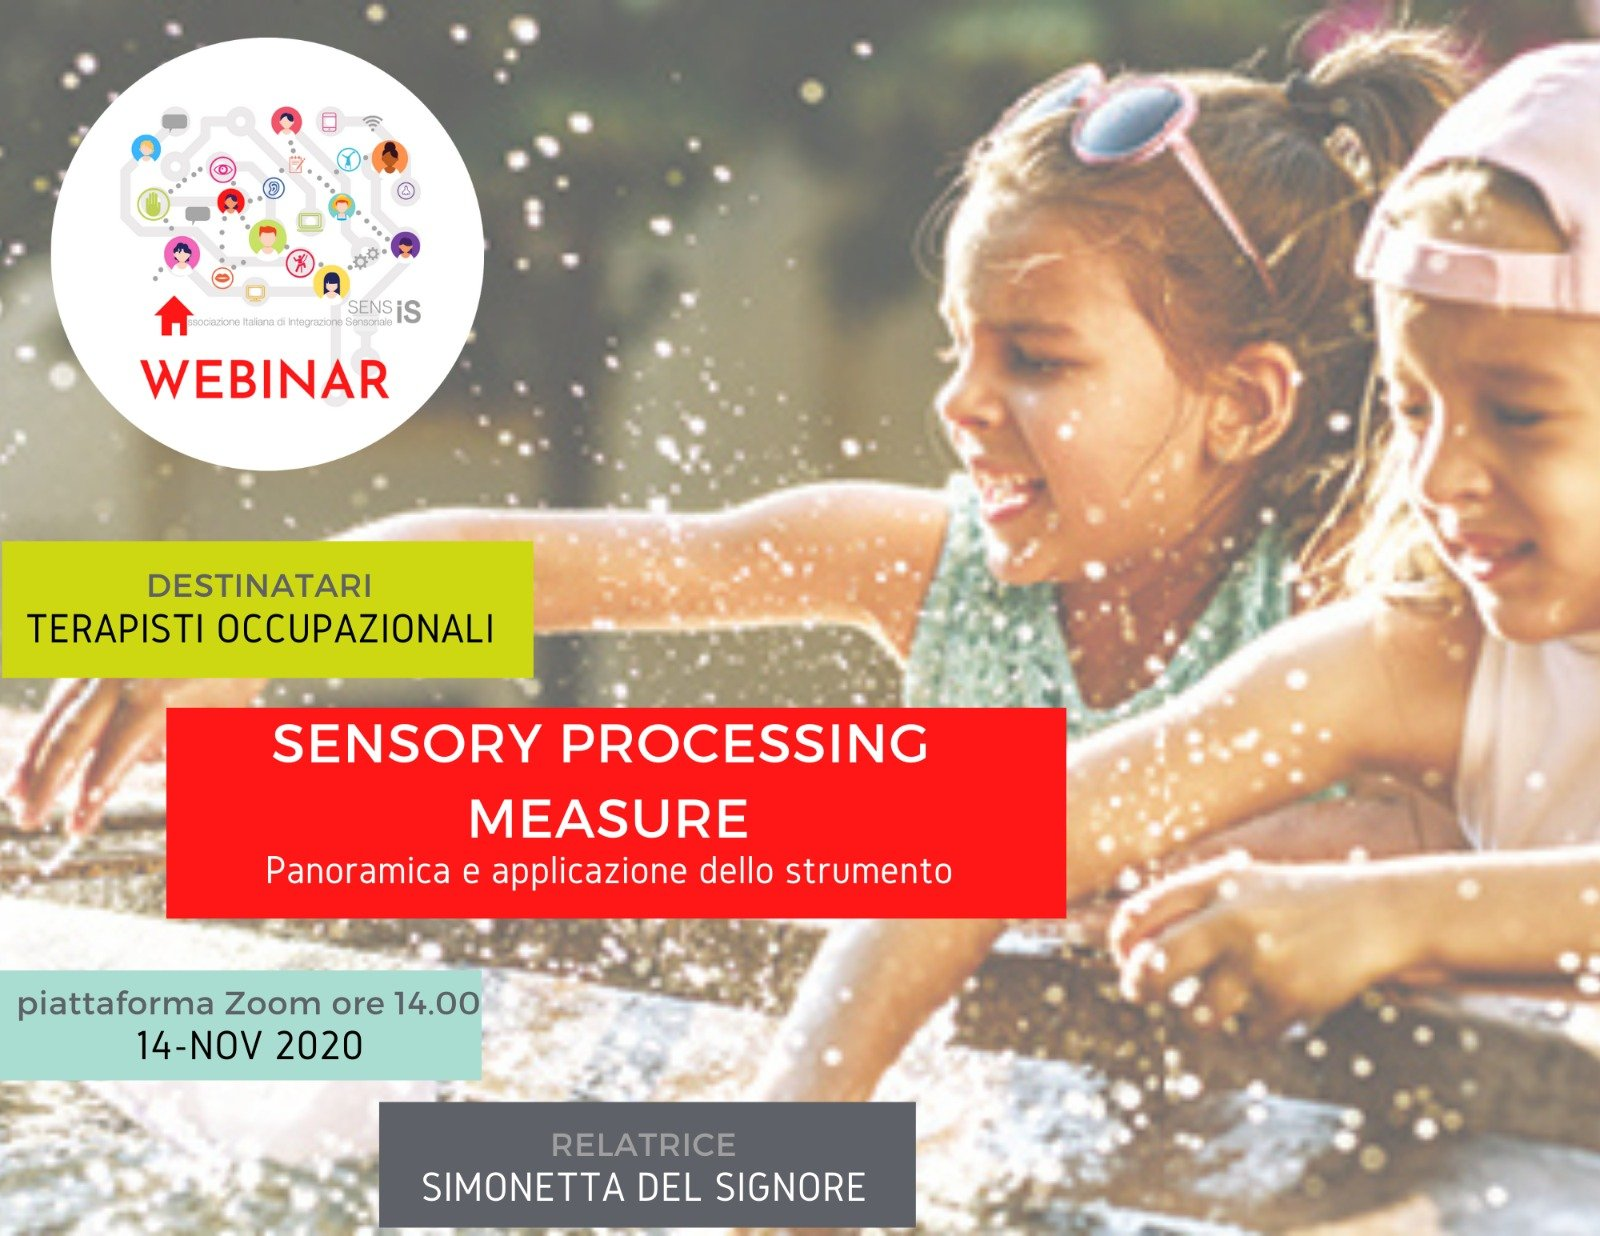 sensory processing measure image